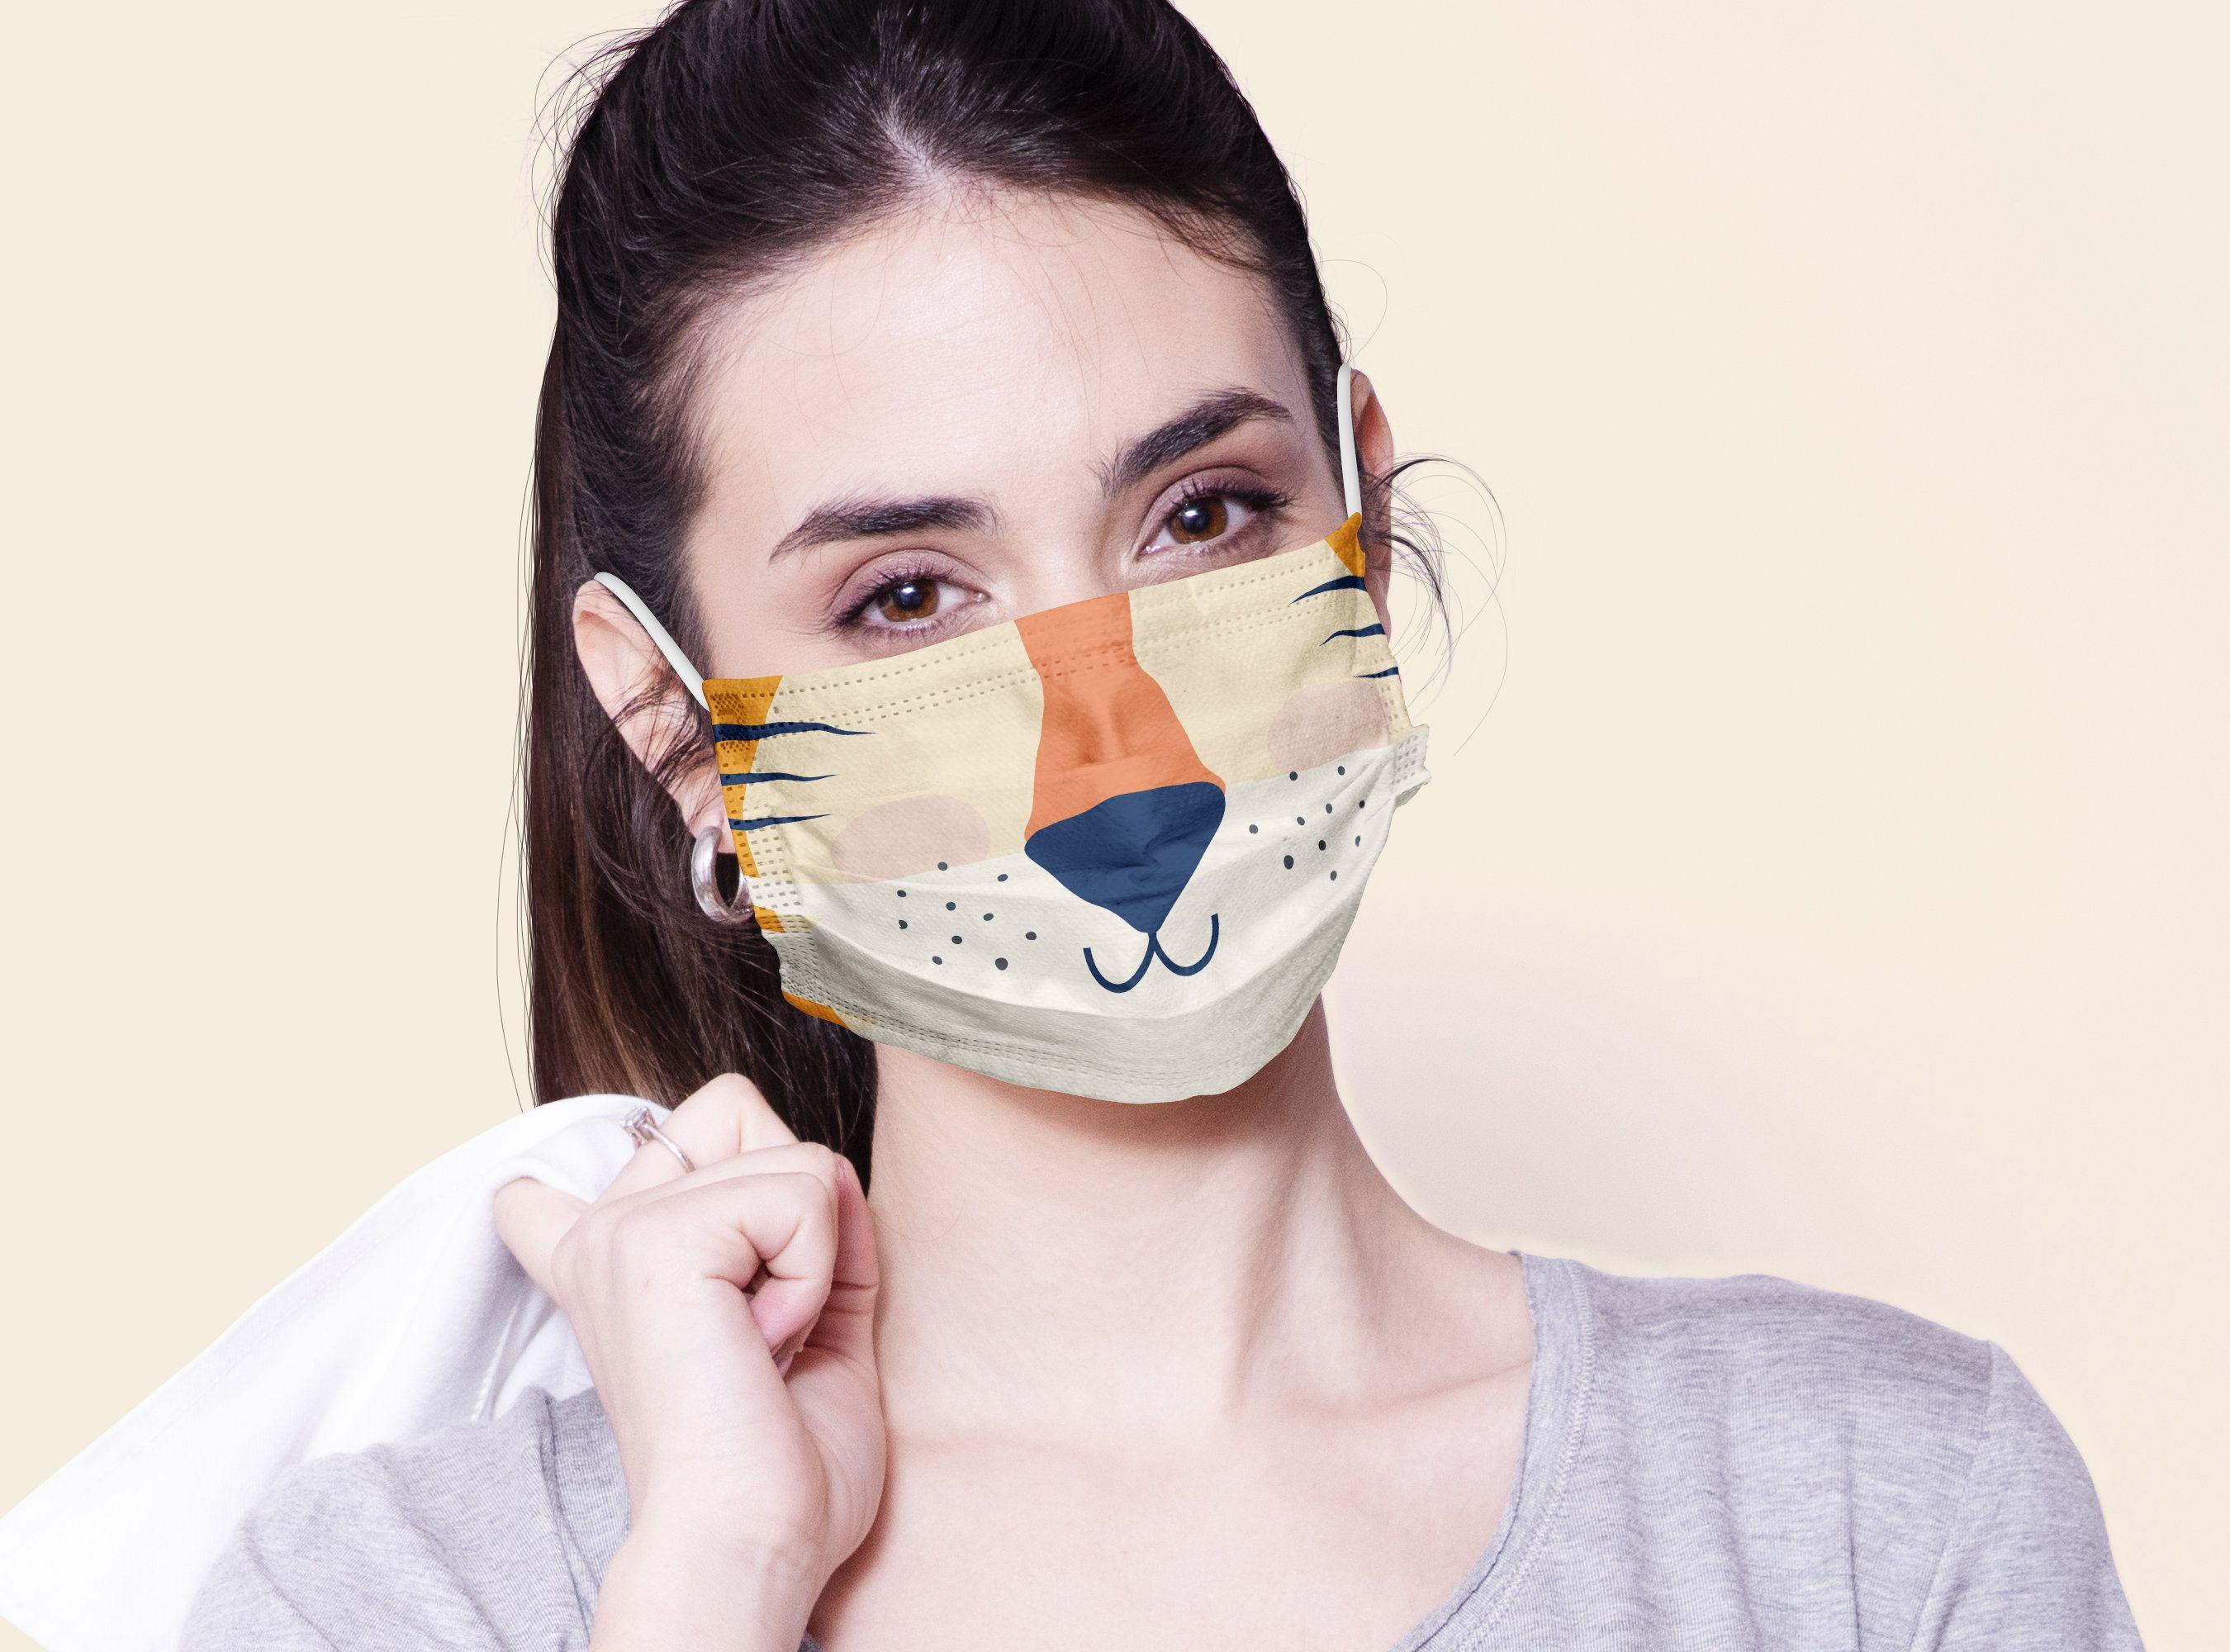 Face Mask Carbon Filter Face Protection Face Mask Design Washable Face Mask Mask With Filter Face Cover Reusable Face Mask In 2020 Face Protection Mask Design Face Mask